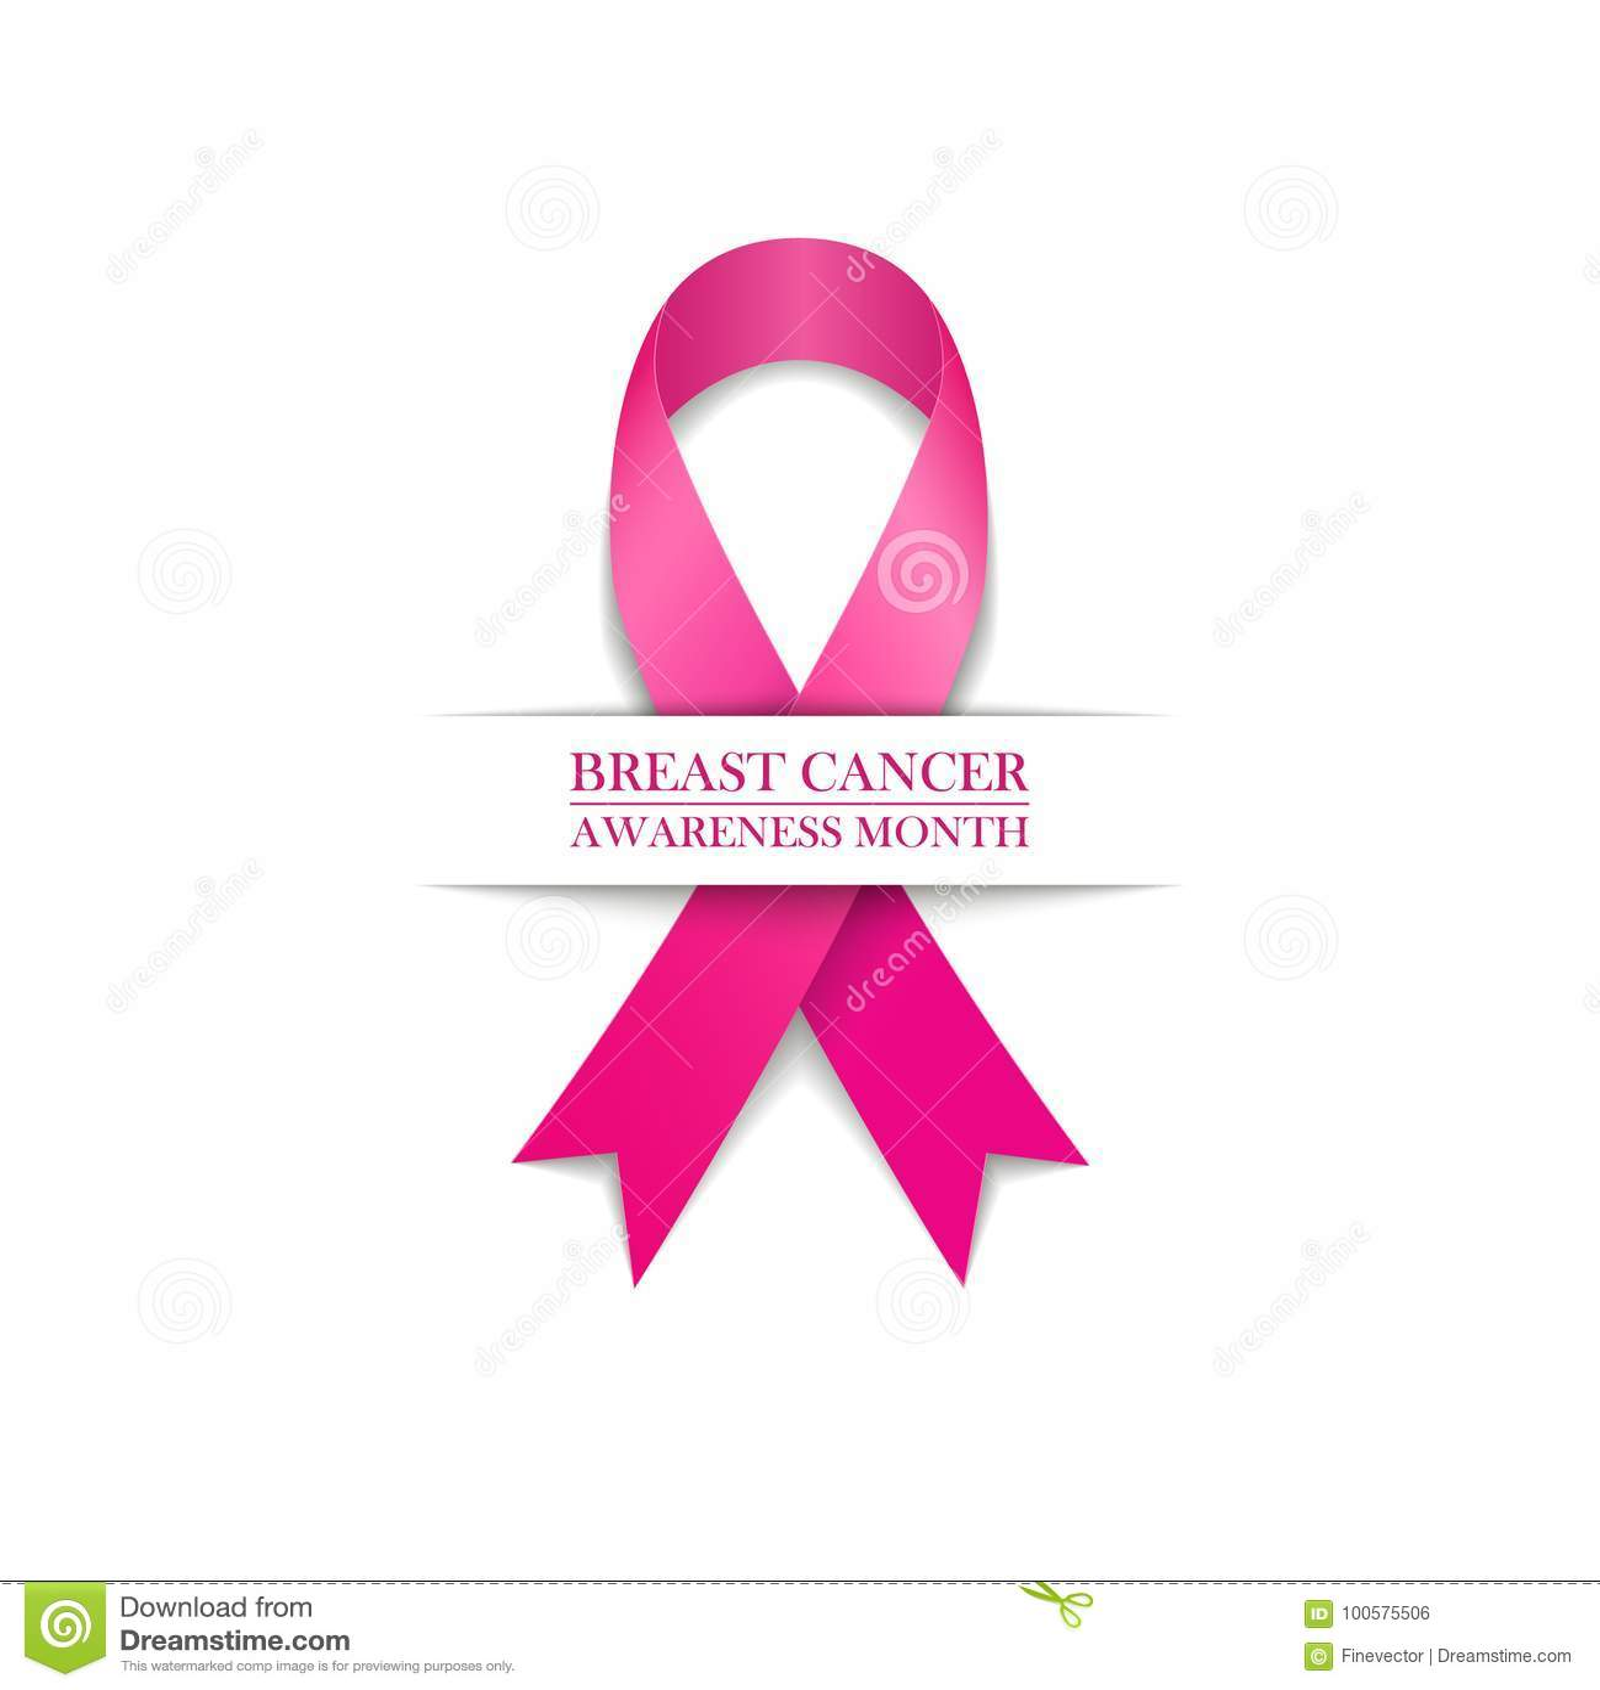 Breast cancer awareness month symbol pink ribbon on white breast cancer awareness month symbol pink ribbon on white background biocorpaavc Choice Image